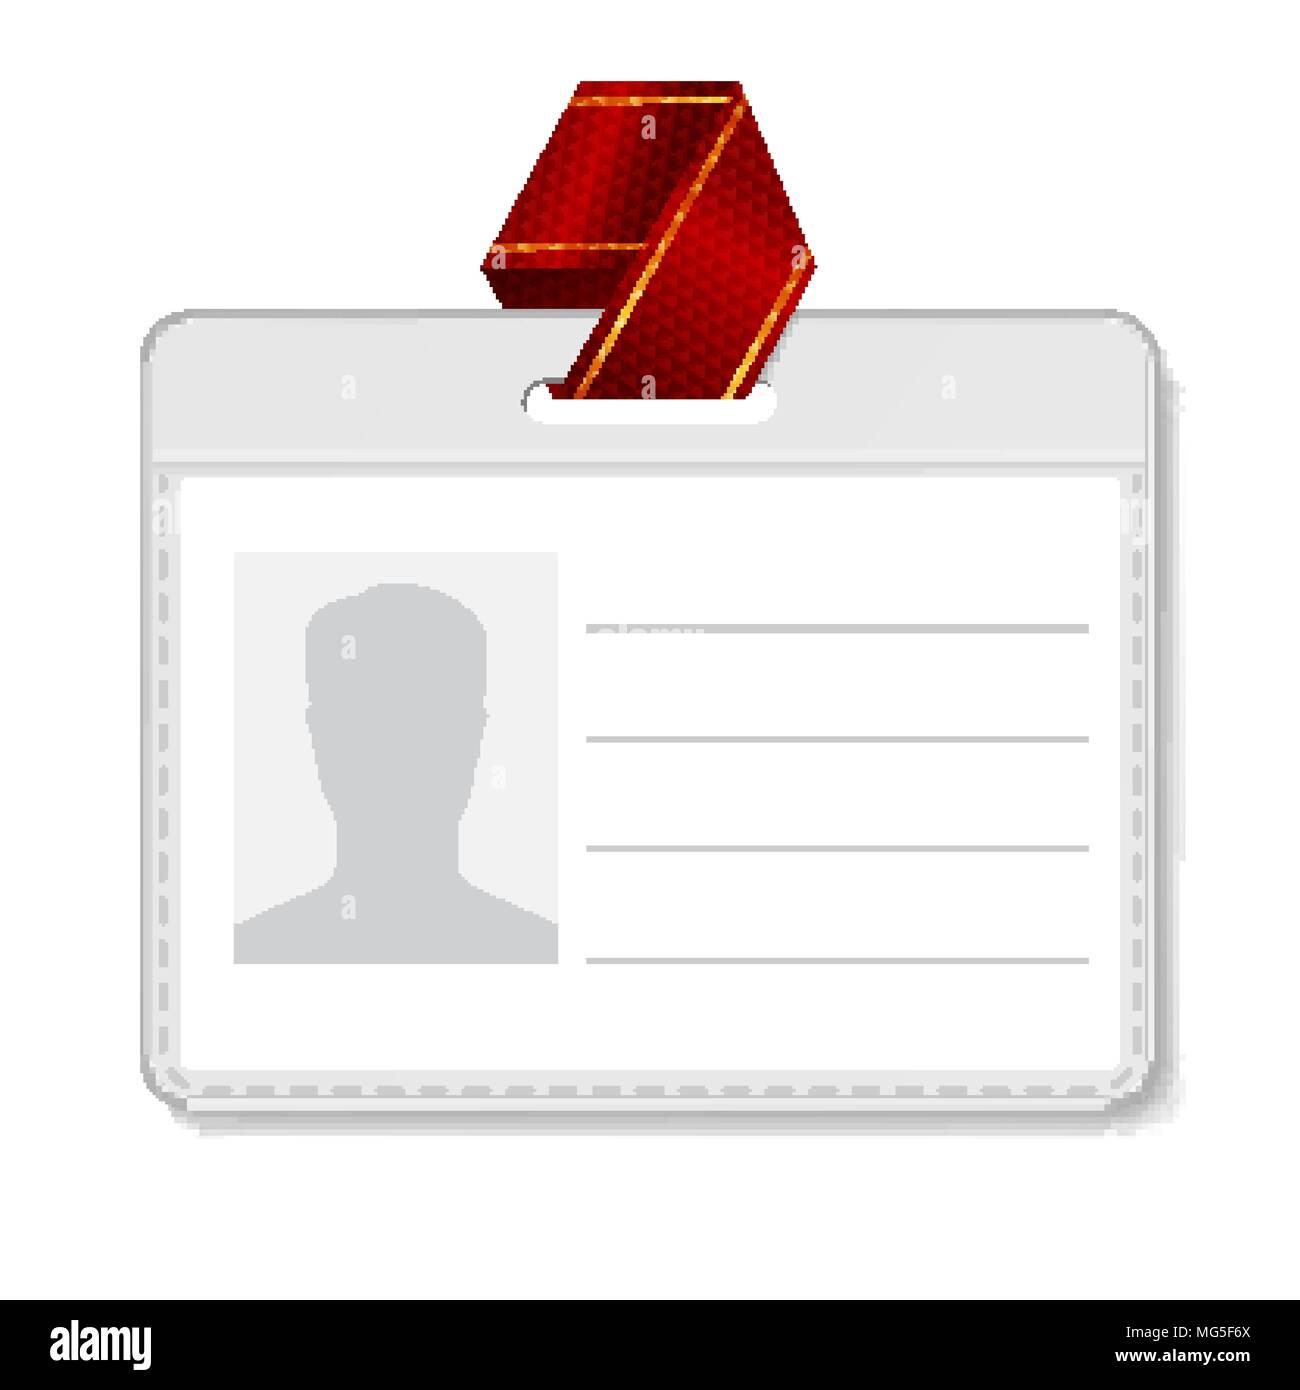 Internationaler Pass Vektor Vorlage Fur Leere 15